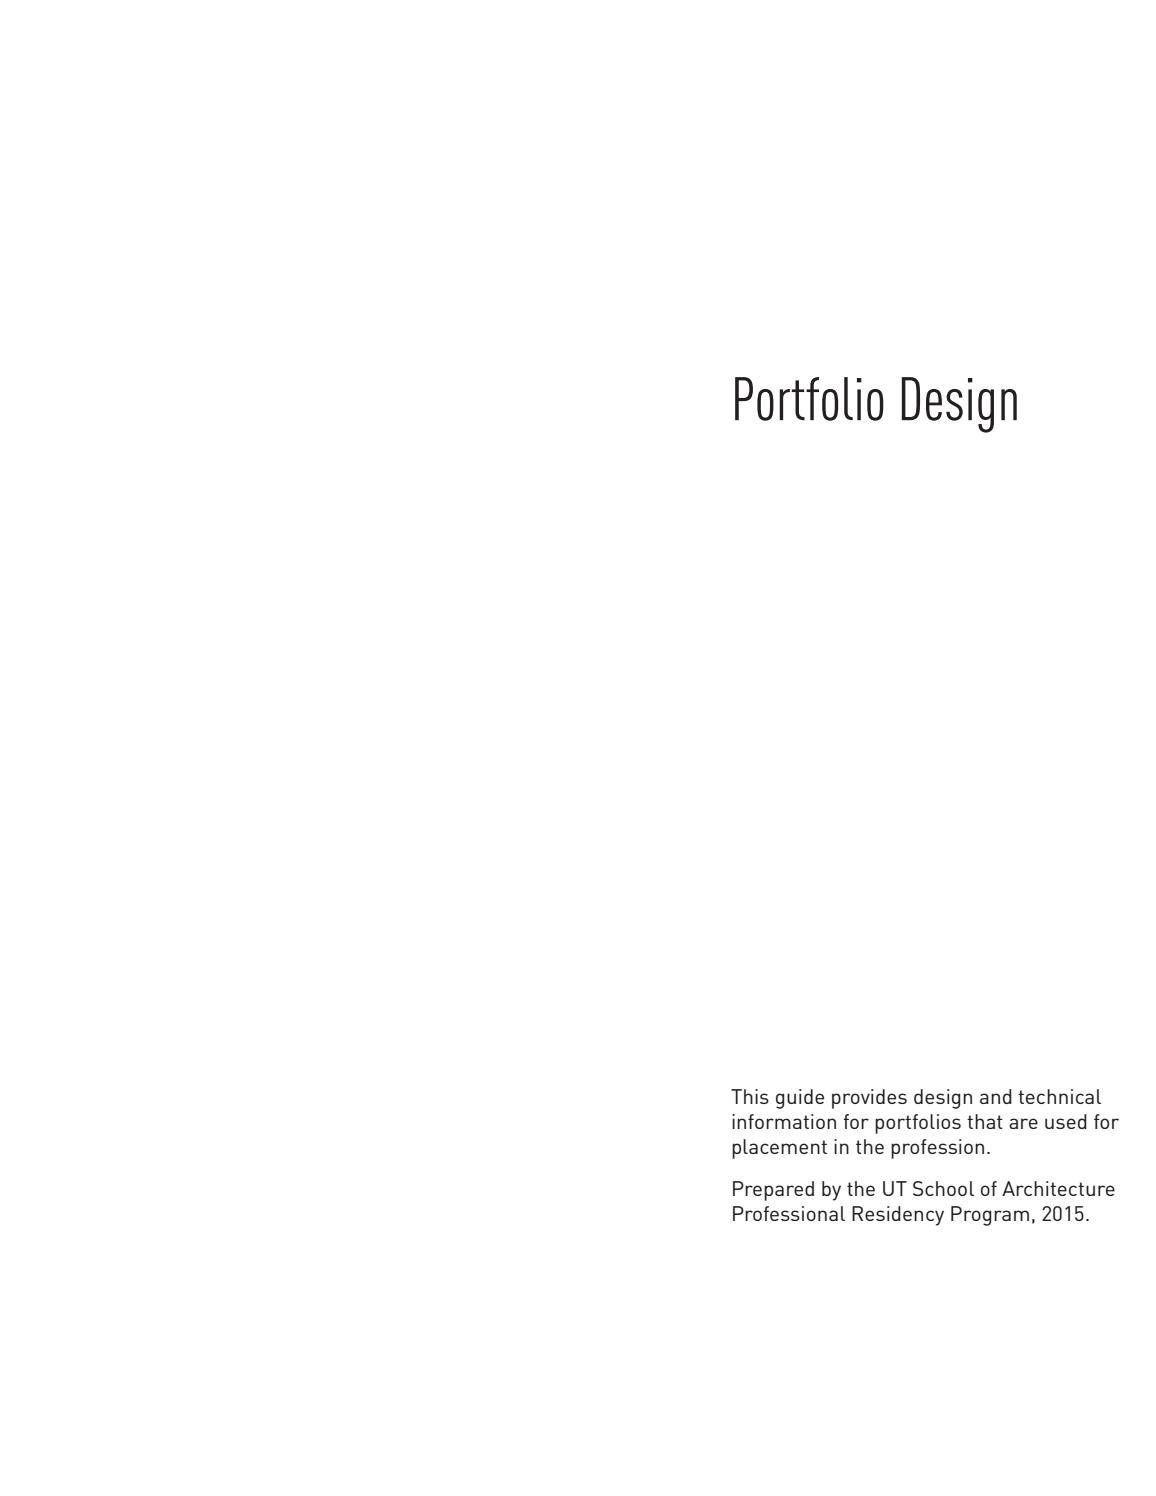 Portfolio Guide by UT School of Architecture - issuu